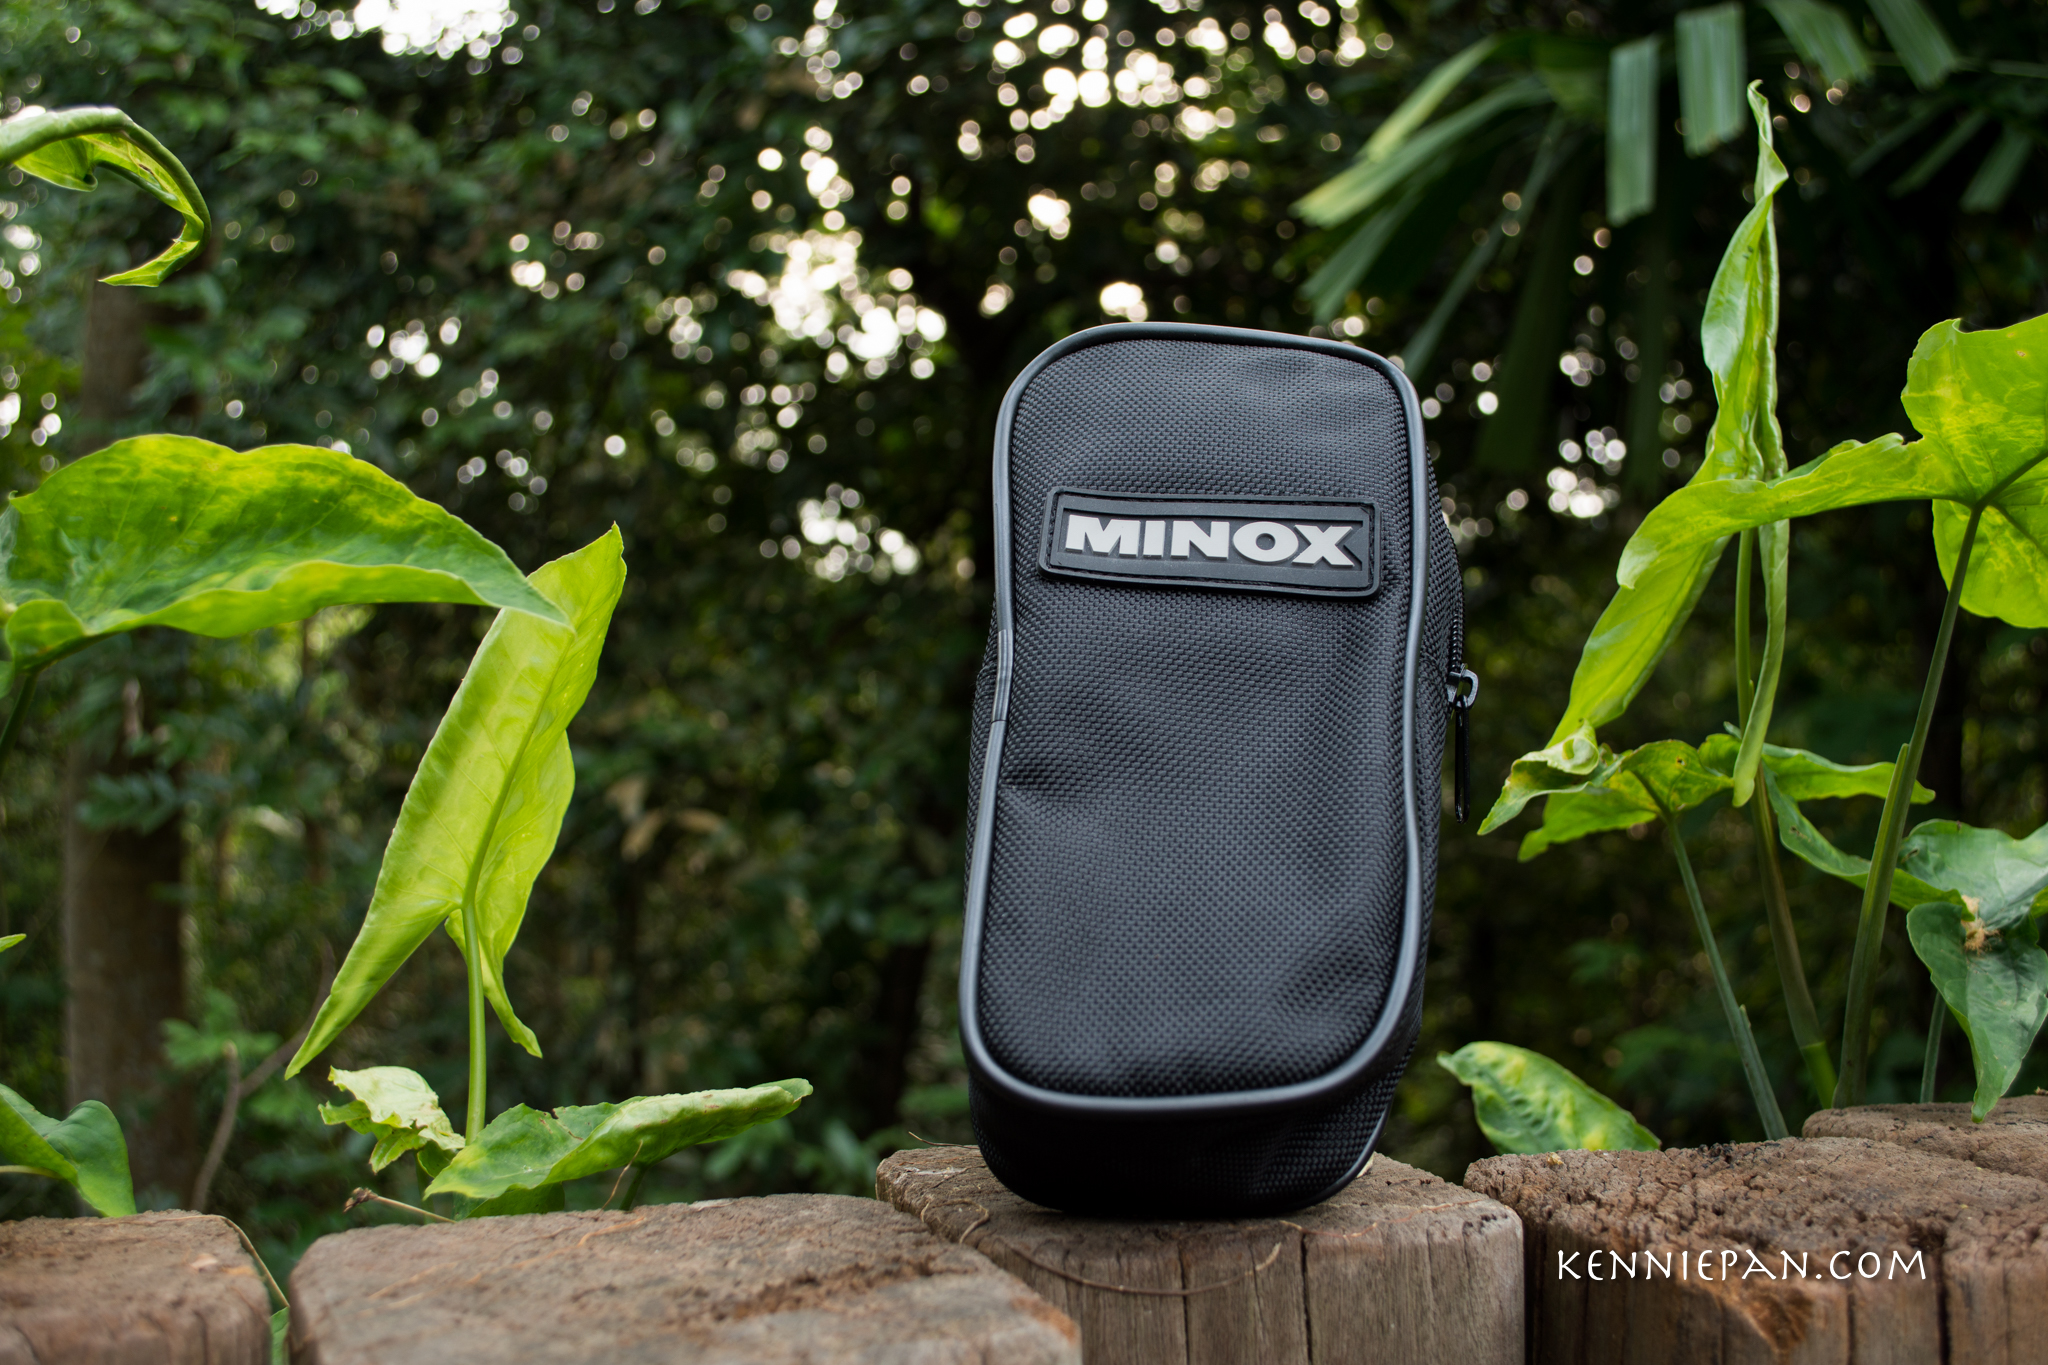 Minox NV 351